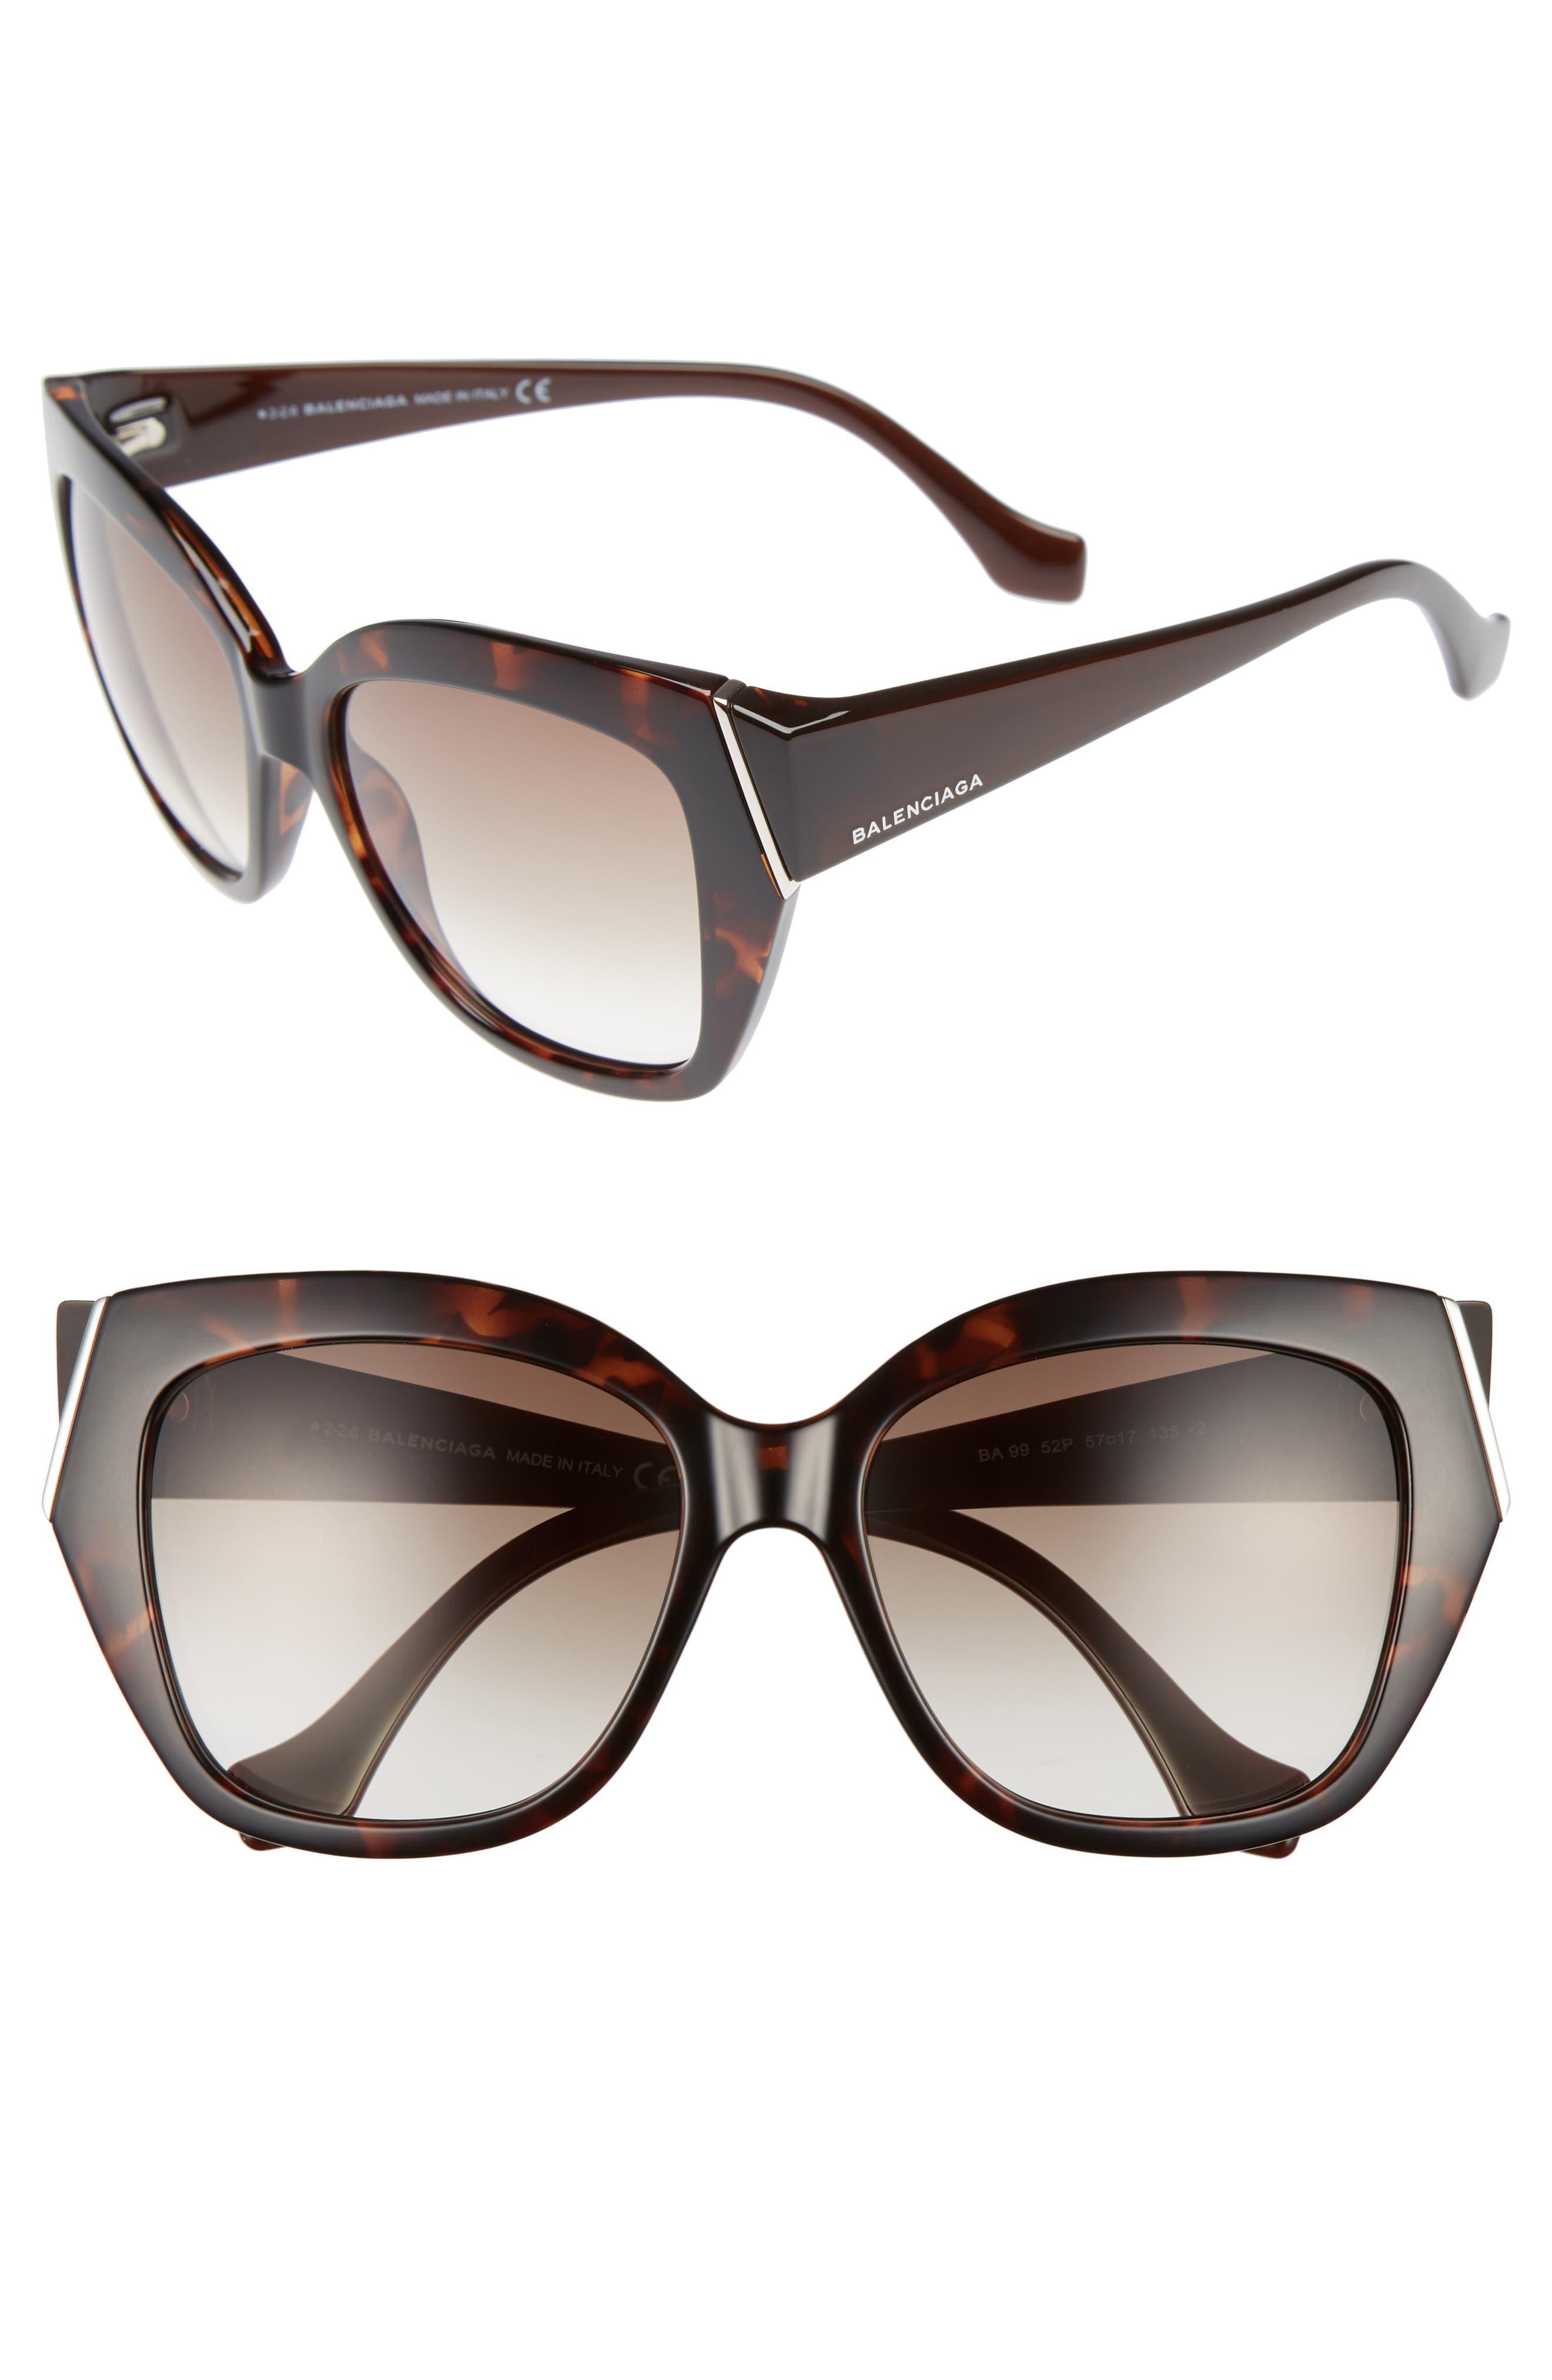 Balenciaga 57mm Cat Eye Sunglasses